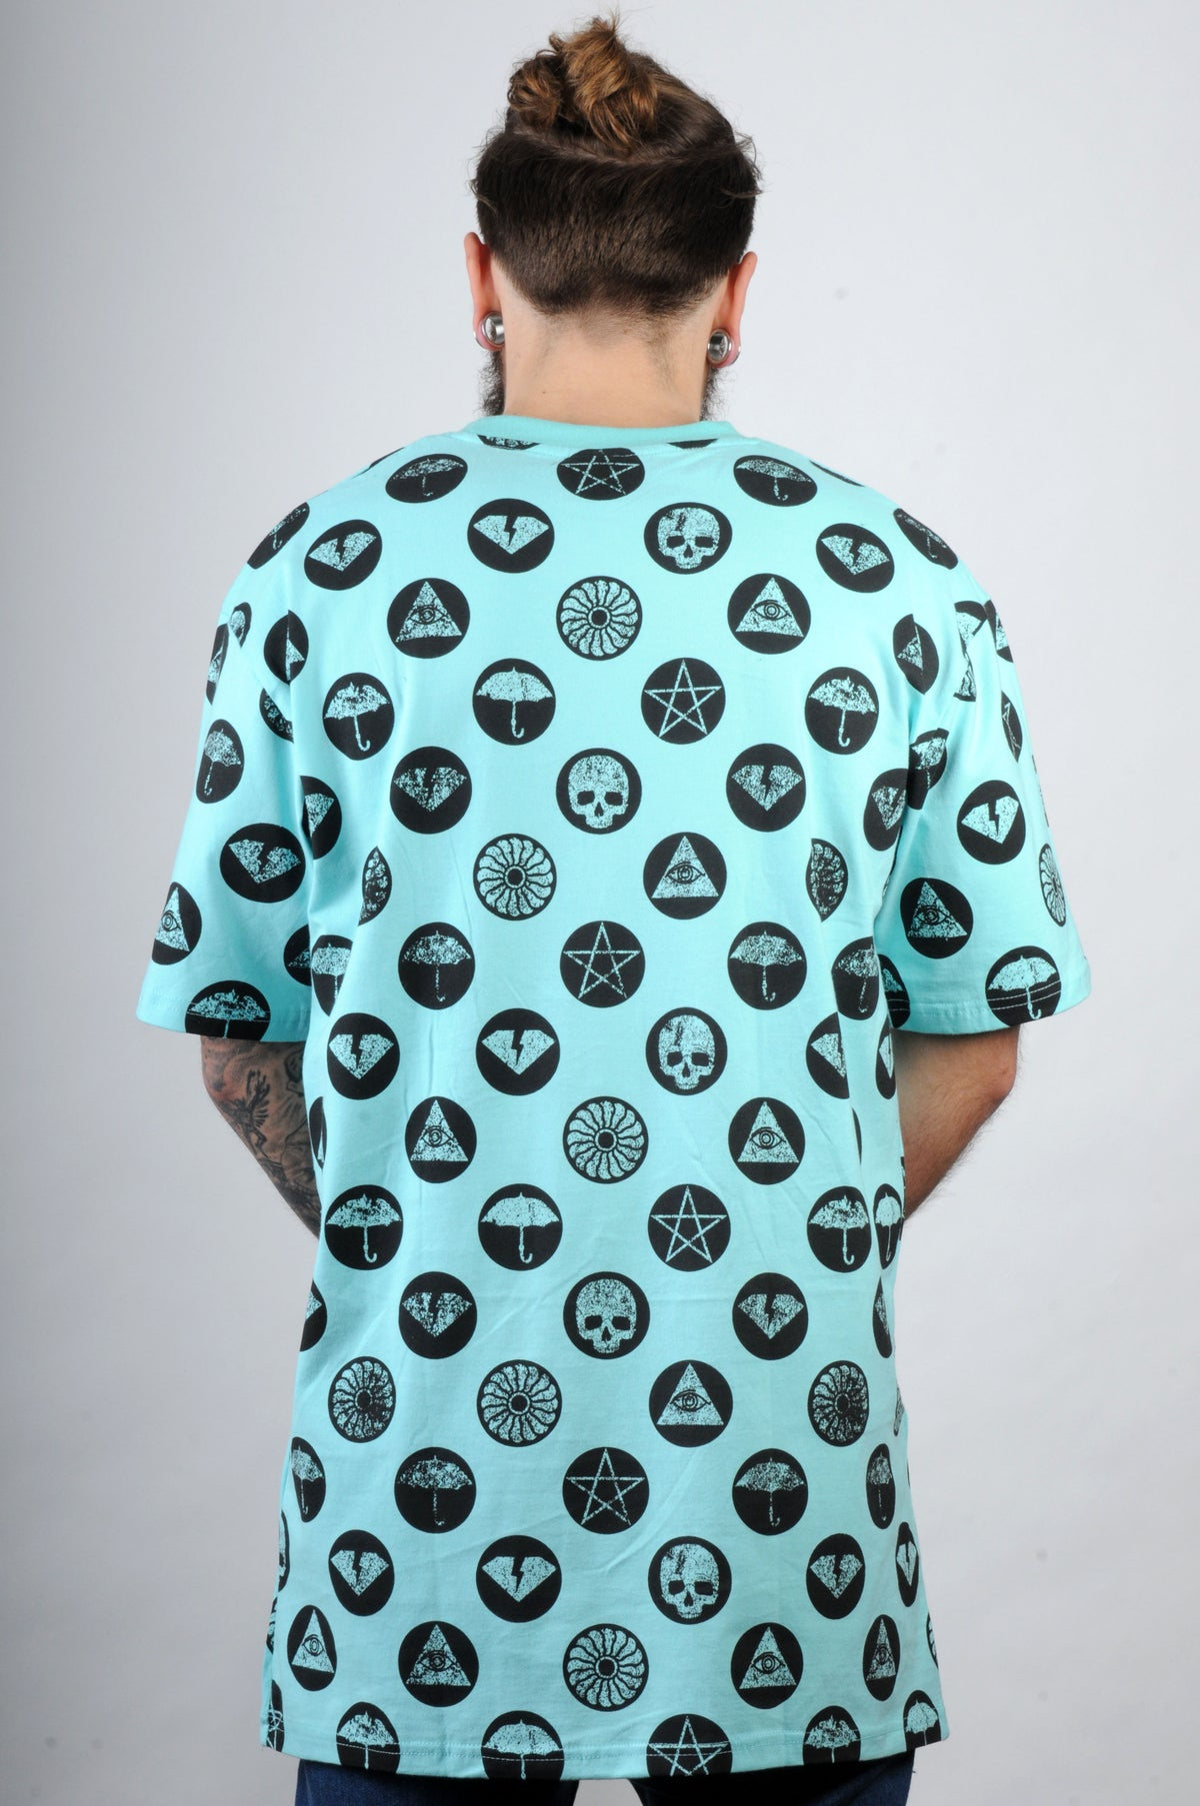 Polkadot T-shirt